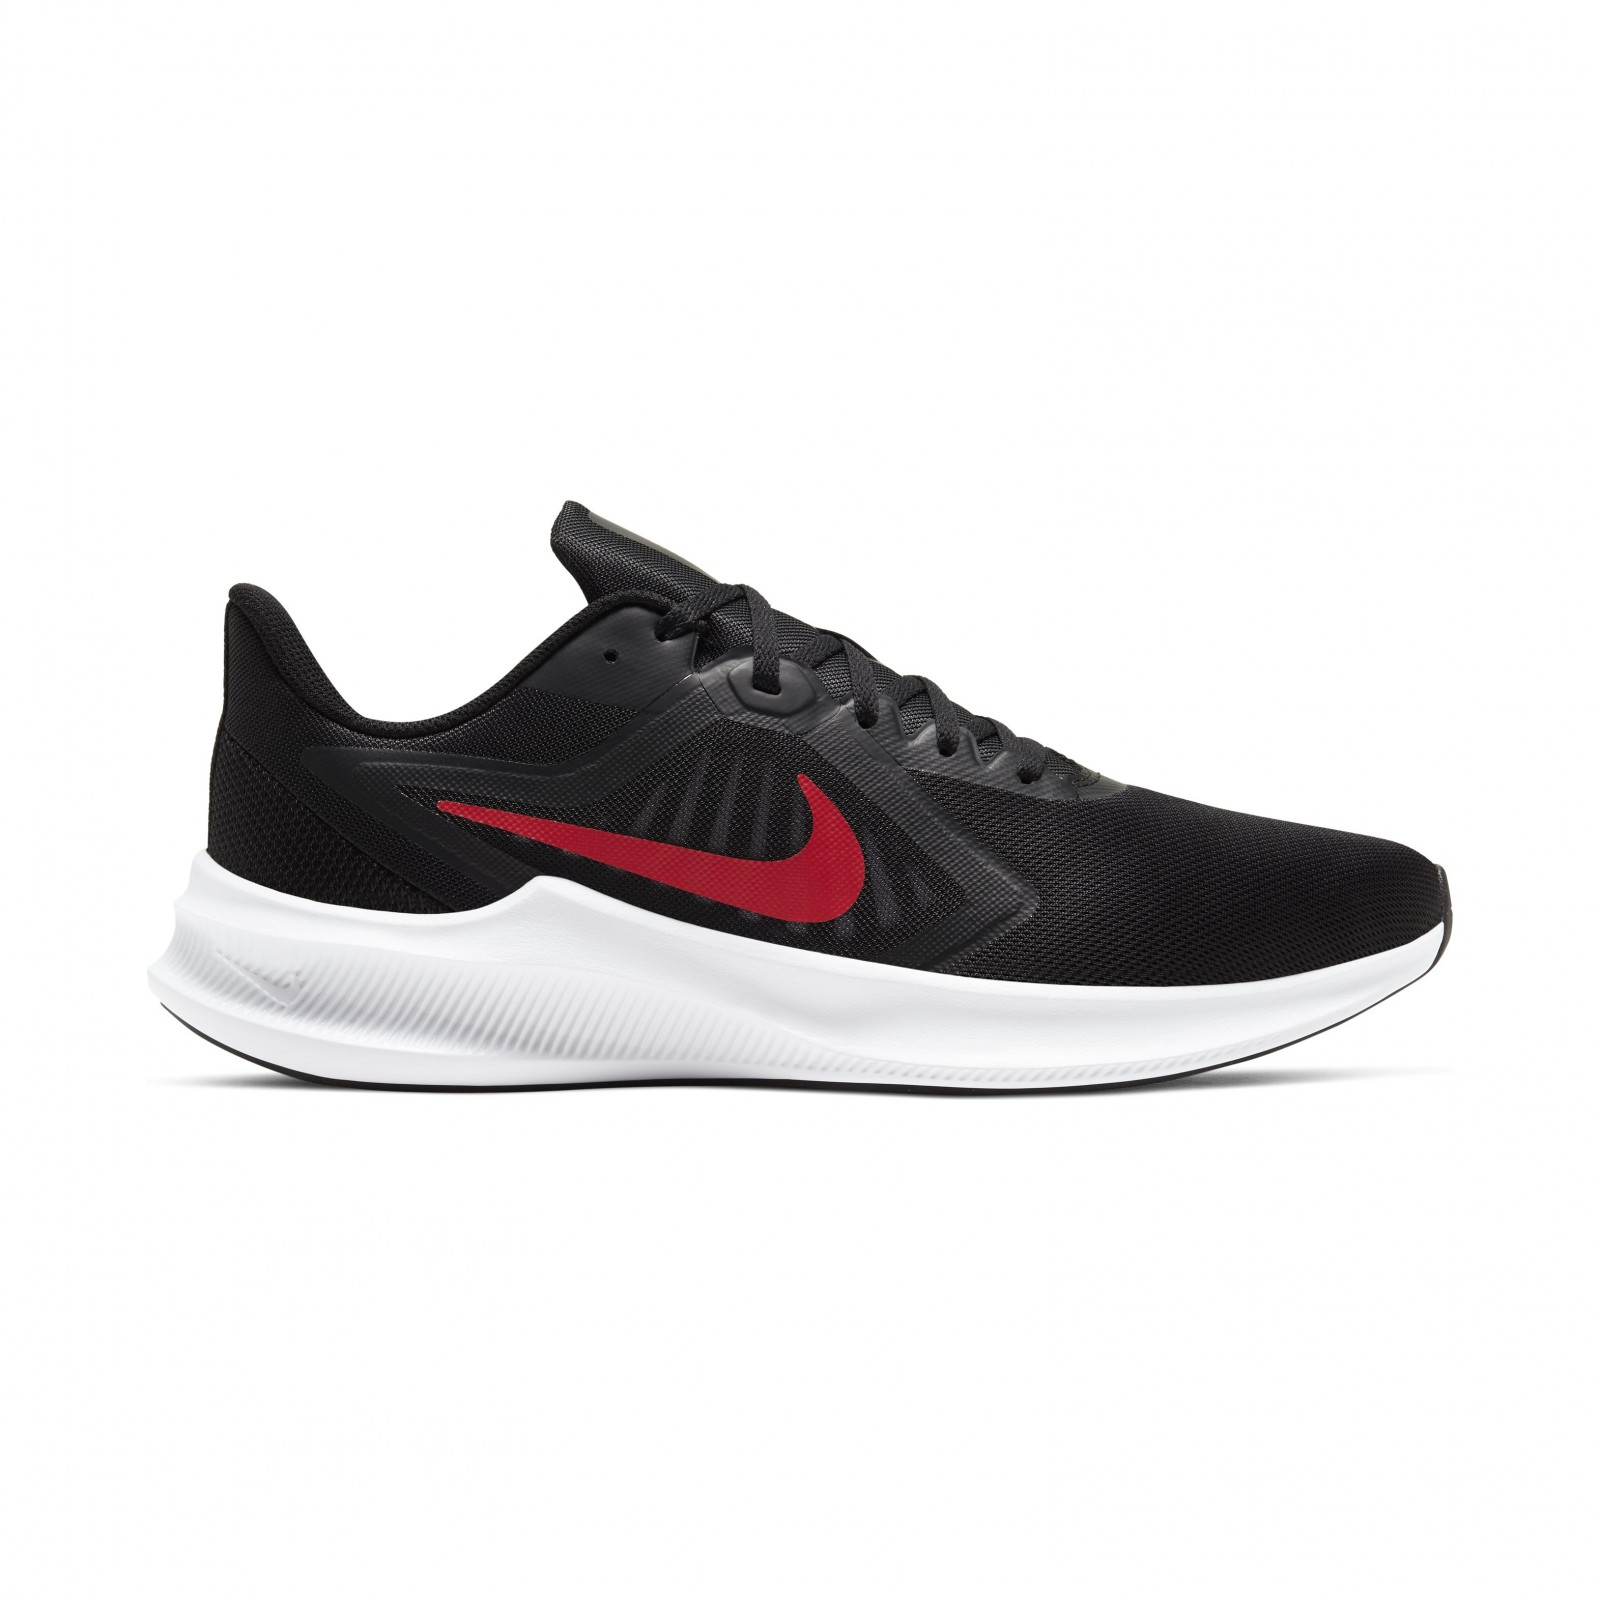 Nike Downshifter 10 BLACK/UNIVERSITY RED-WHITE